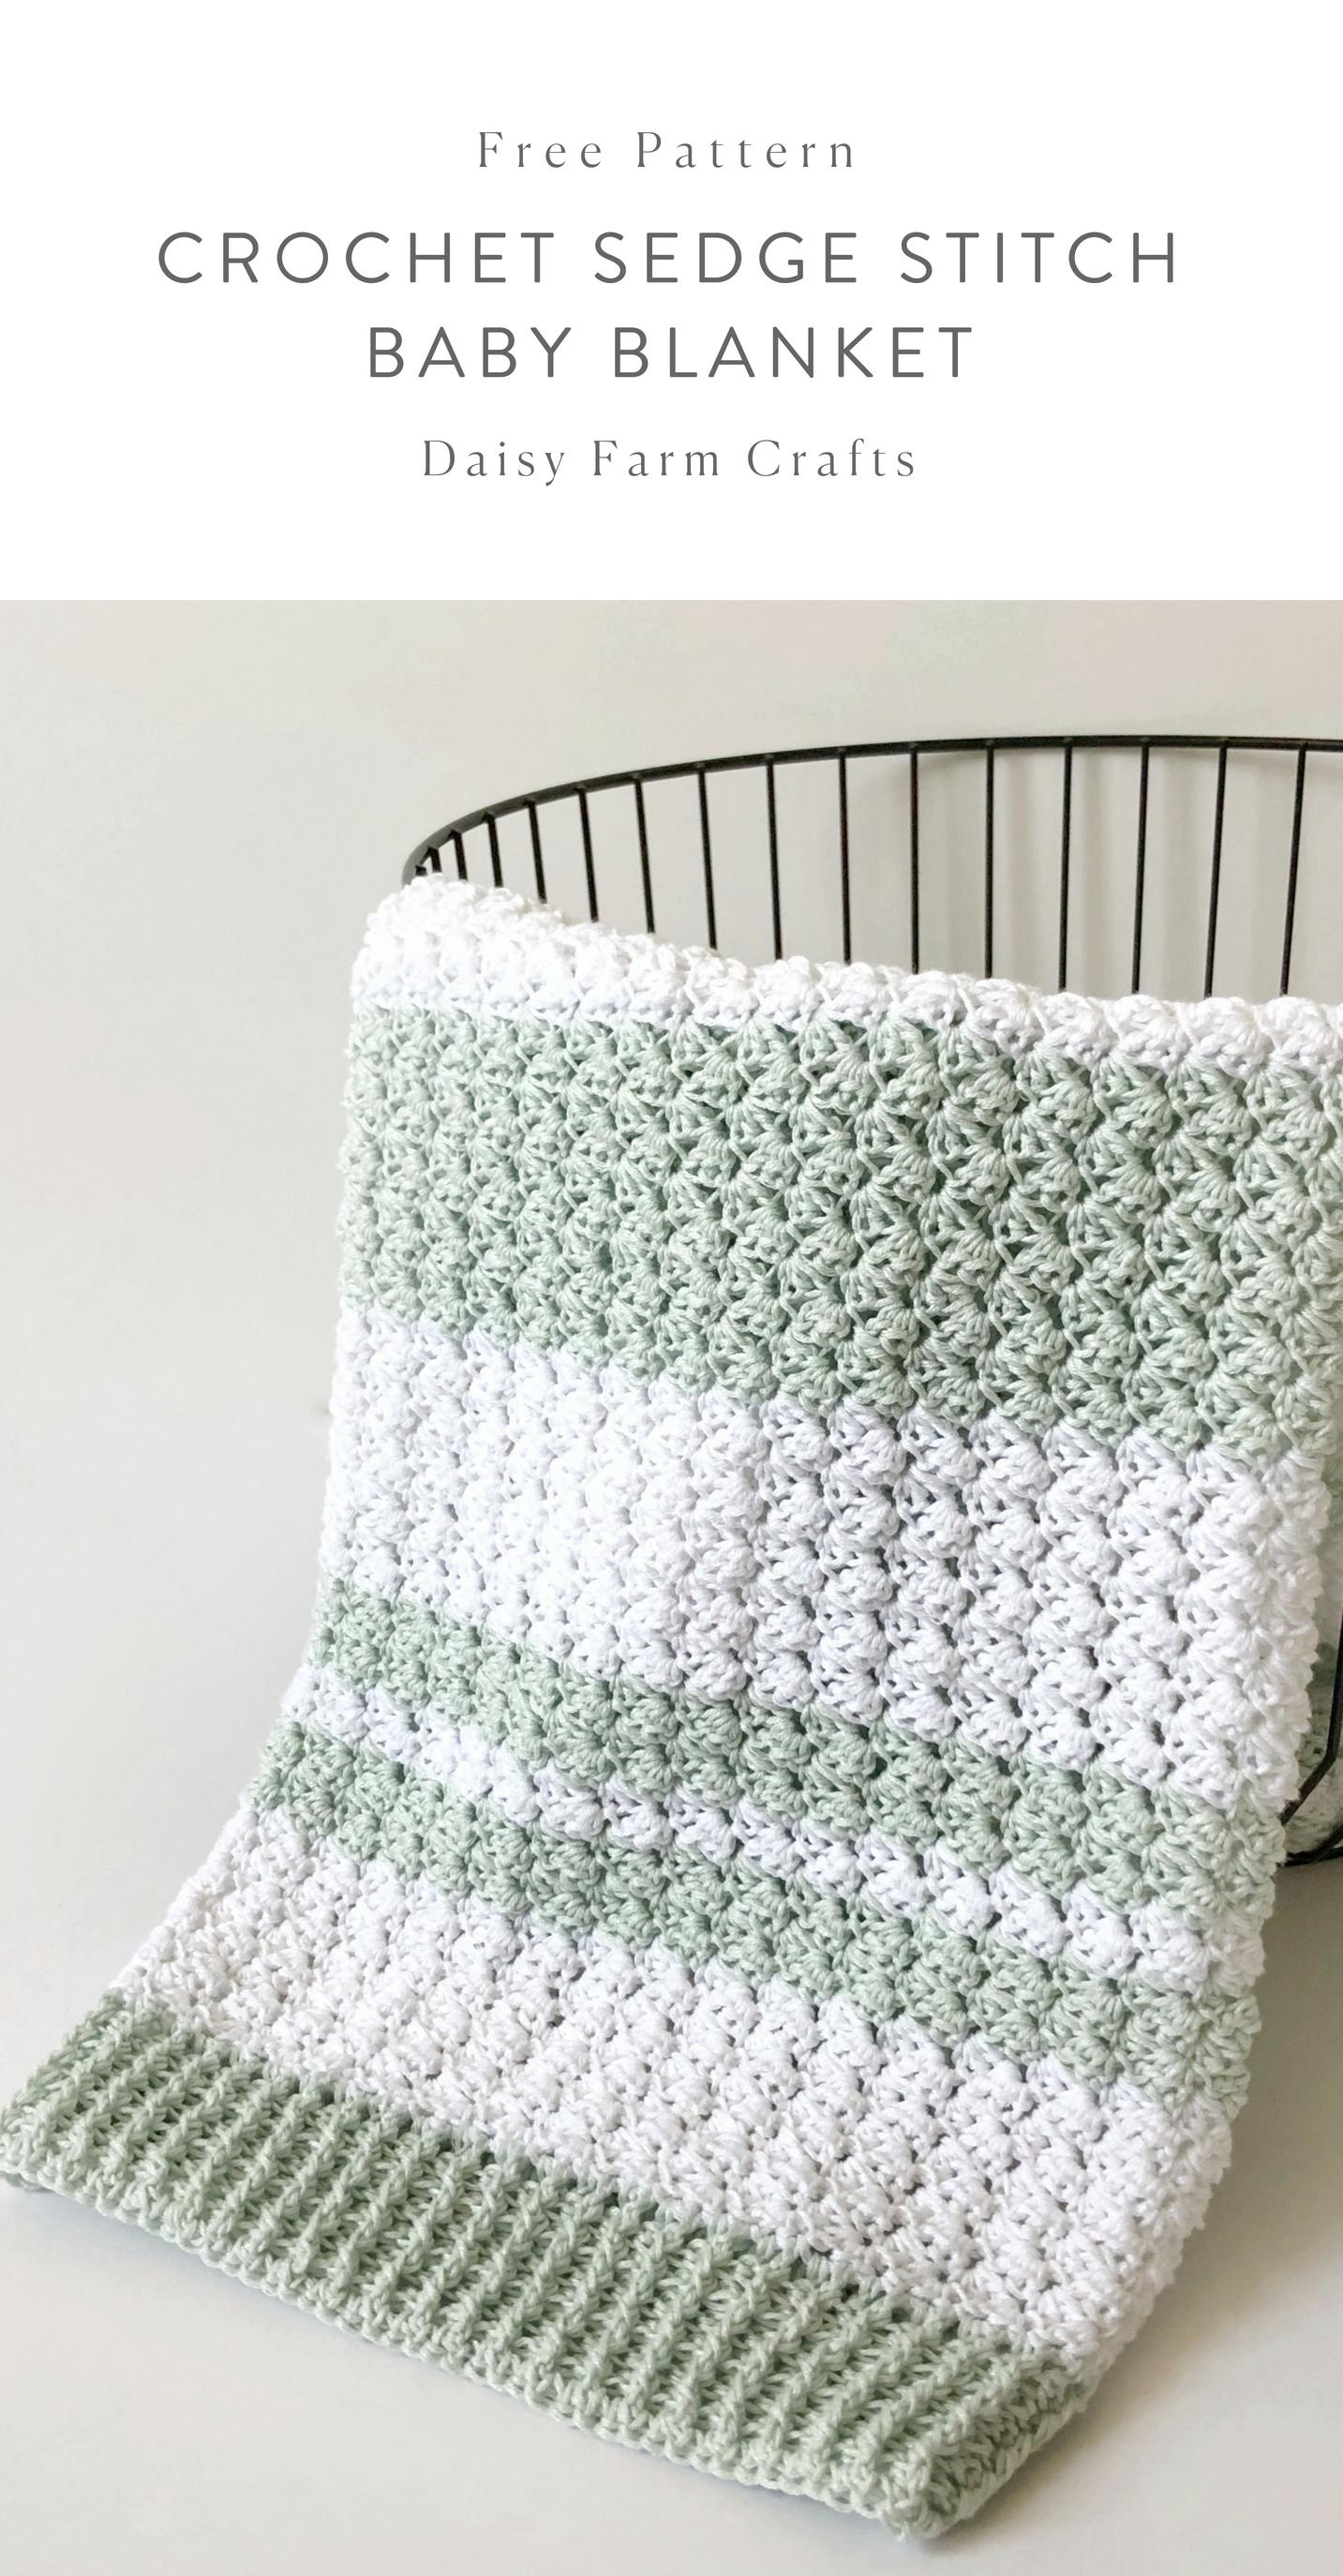 Free Pattern - Crochet Sedge Stitch Baby Blanket #crochet | Crochet ...